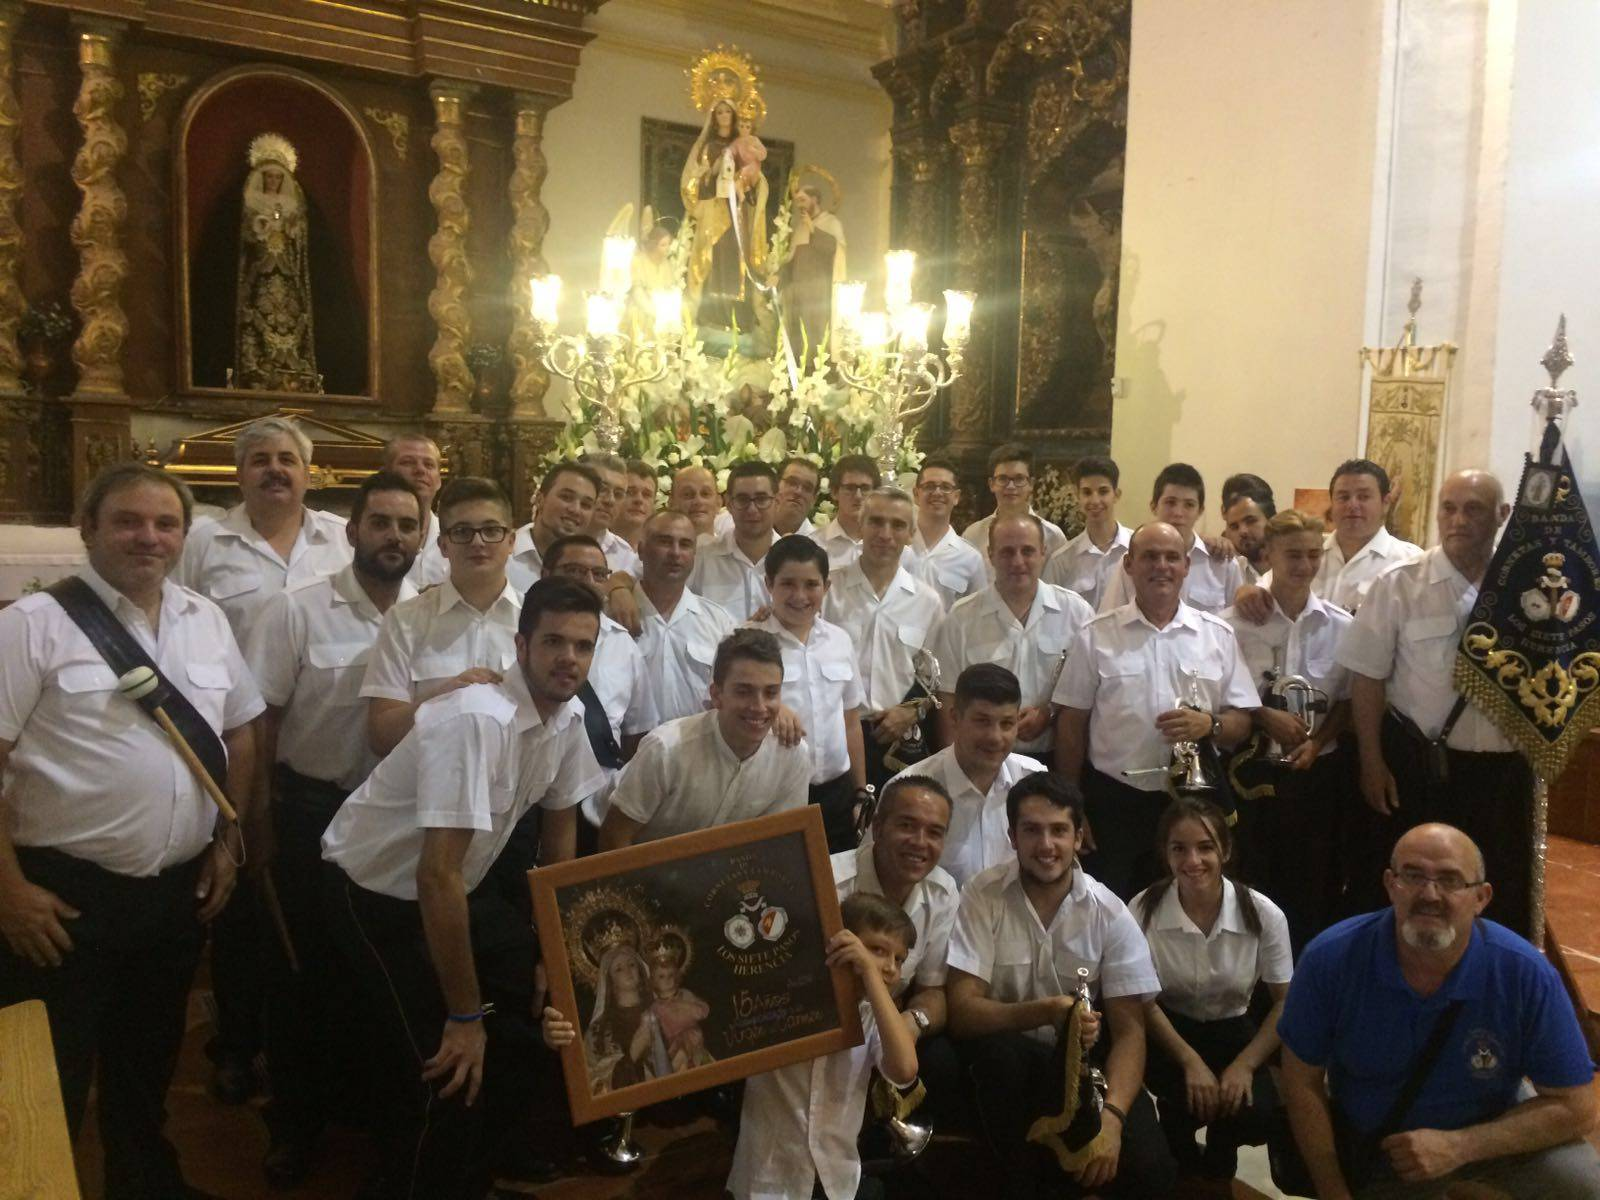 banda siete pasos y virgen del carmen - Banda Siete Pasos: 15 años acompañando a la Virgen del Carmen